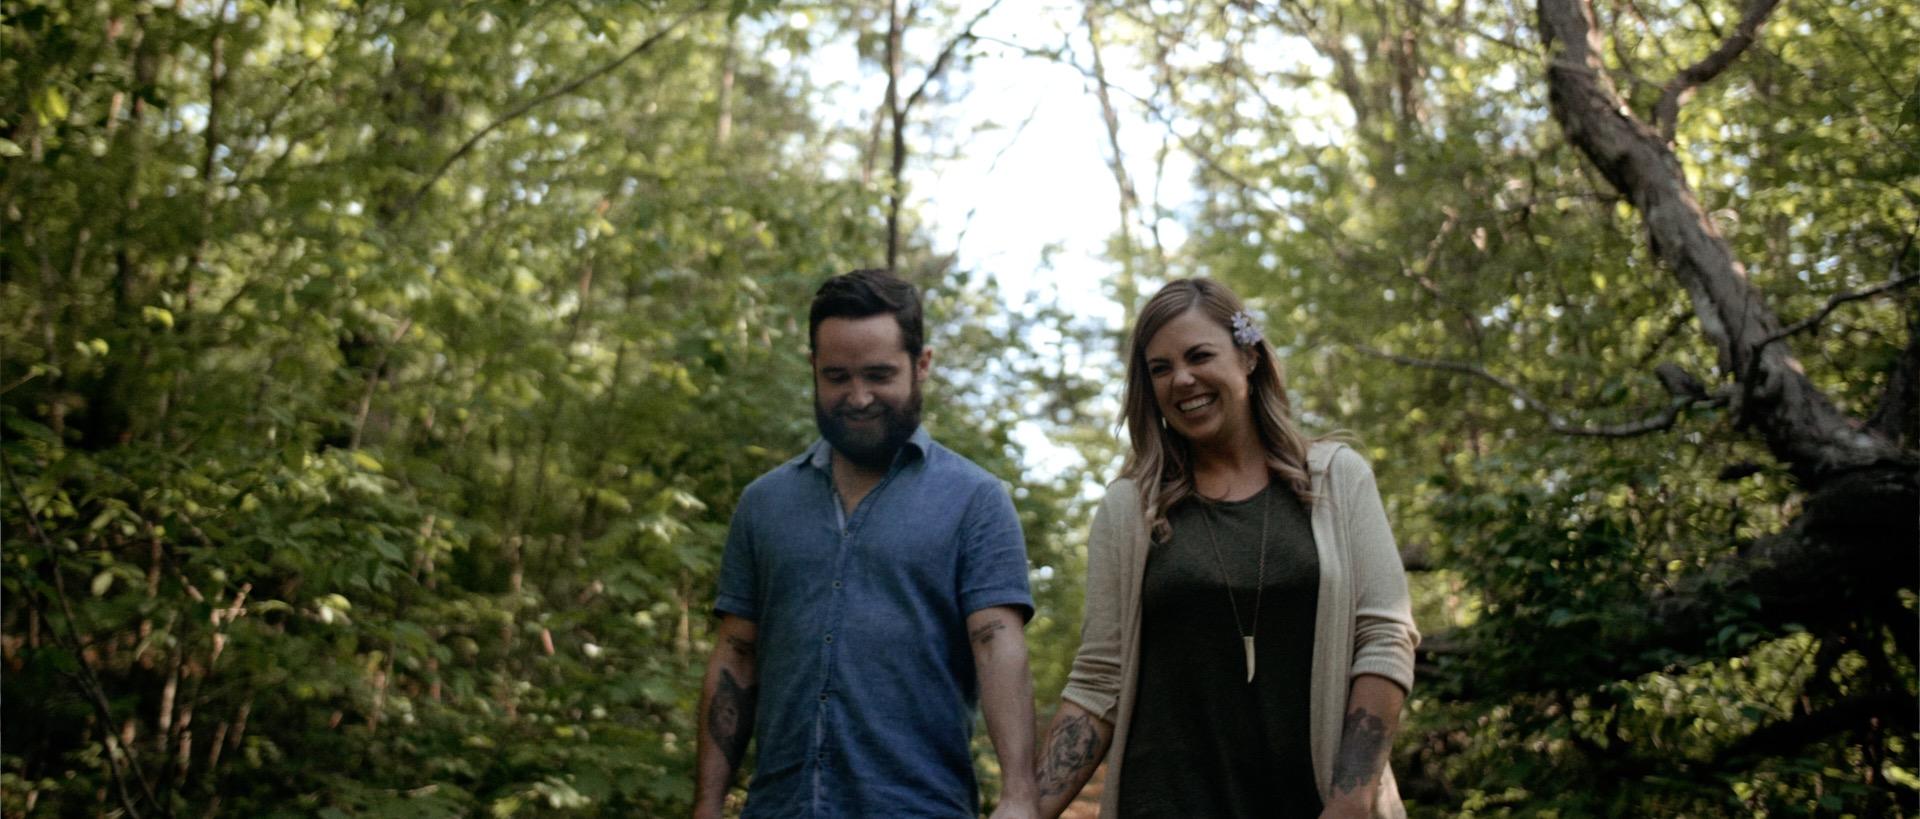 Christian + Sara | Trenton, Georgia | The Barn at High Point